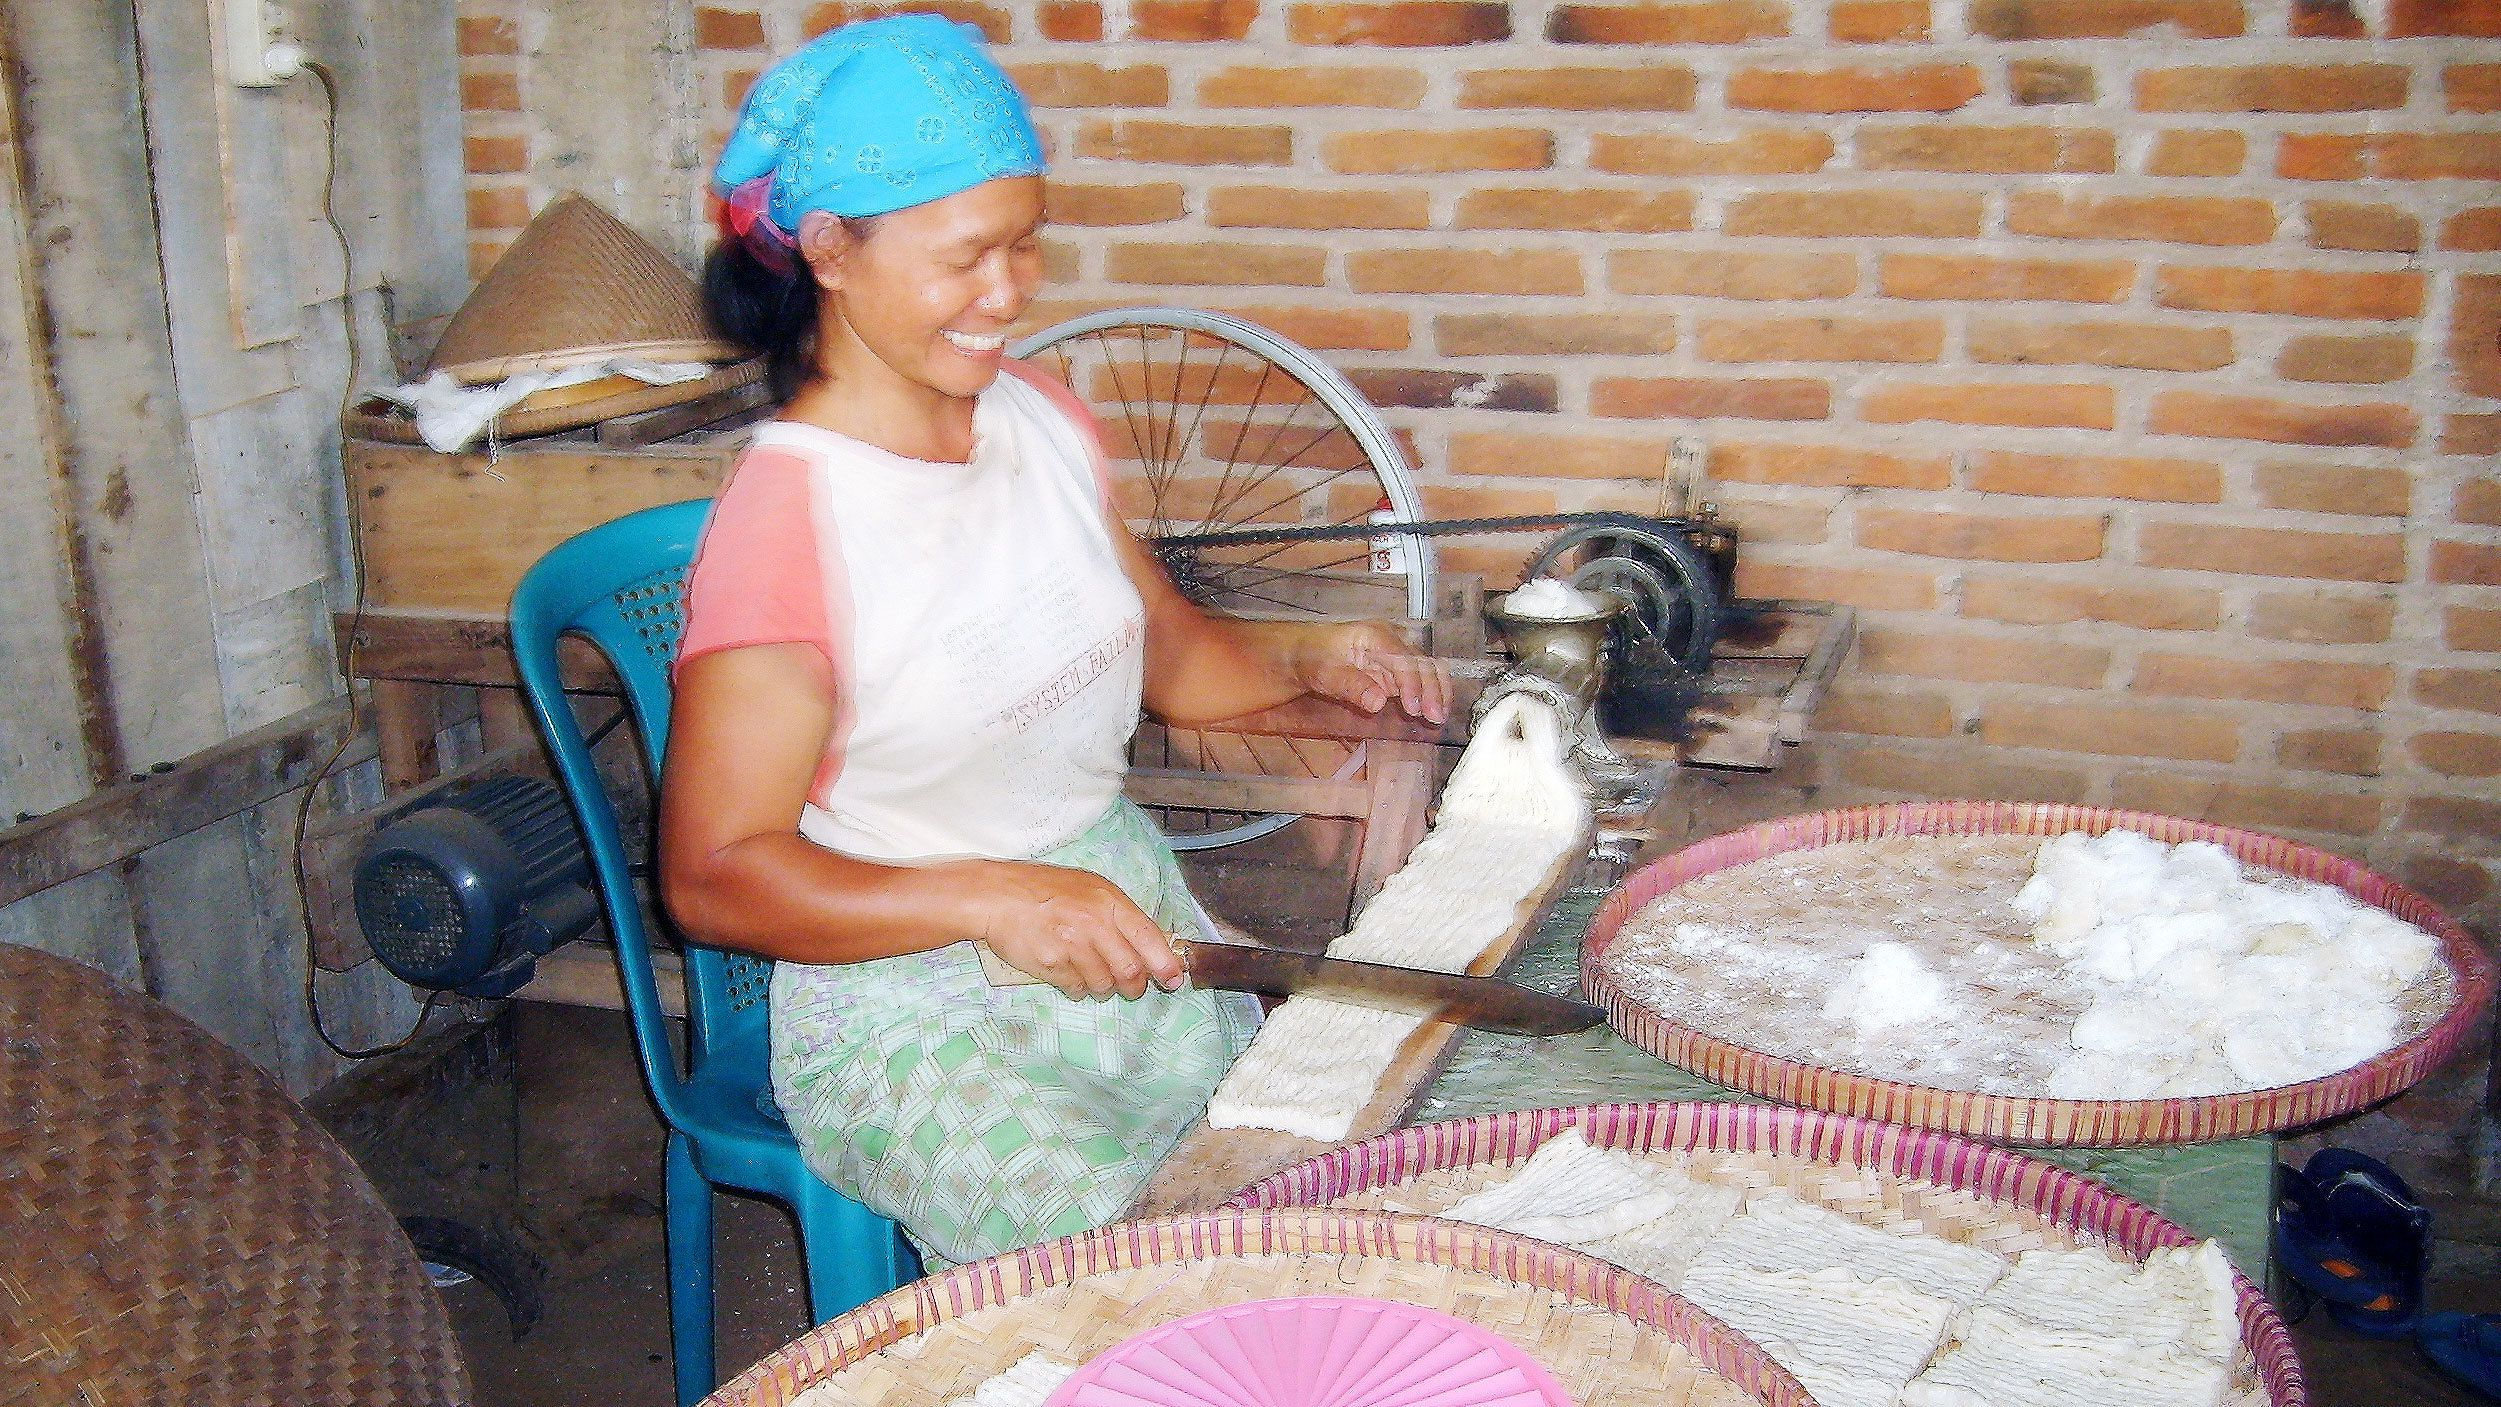 Woman preparing food in Candirejo Village